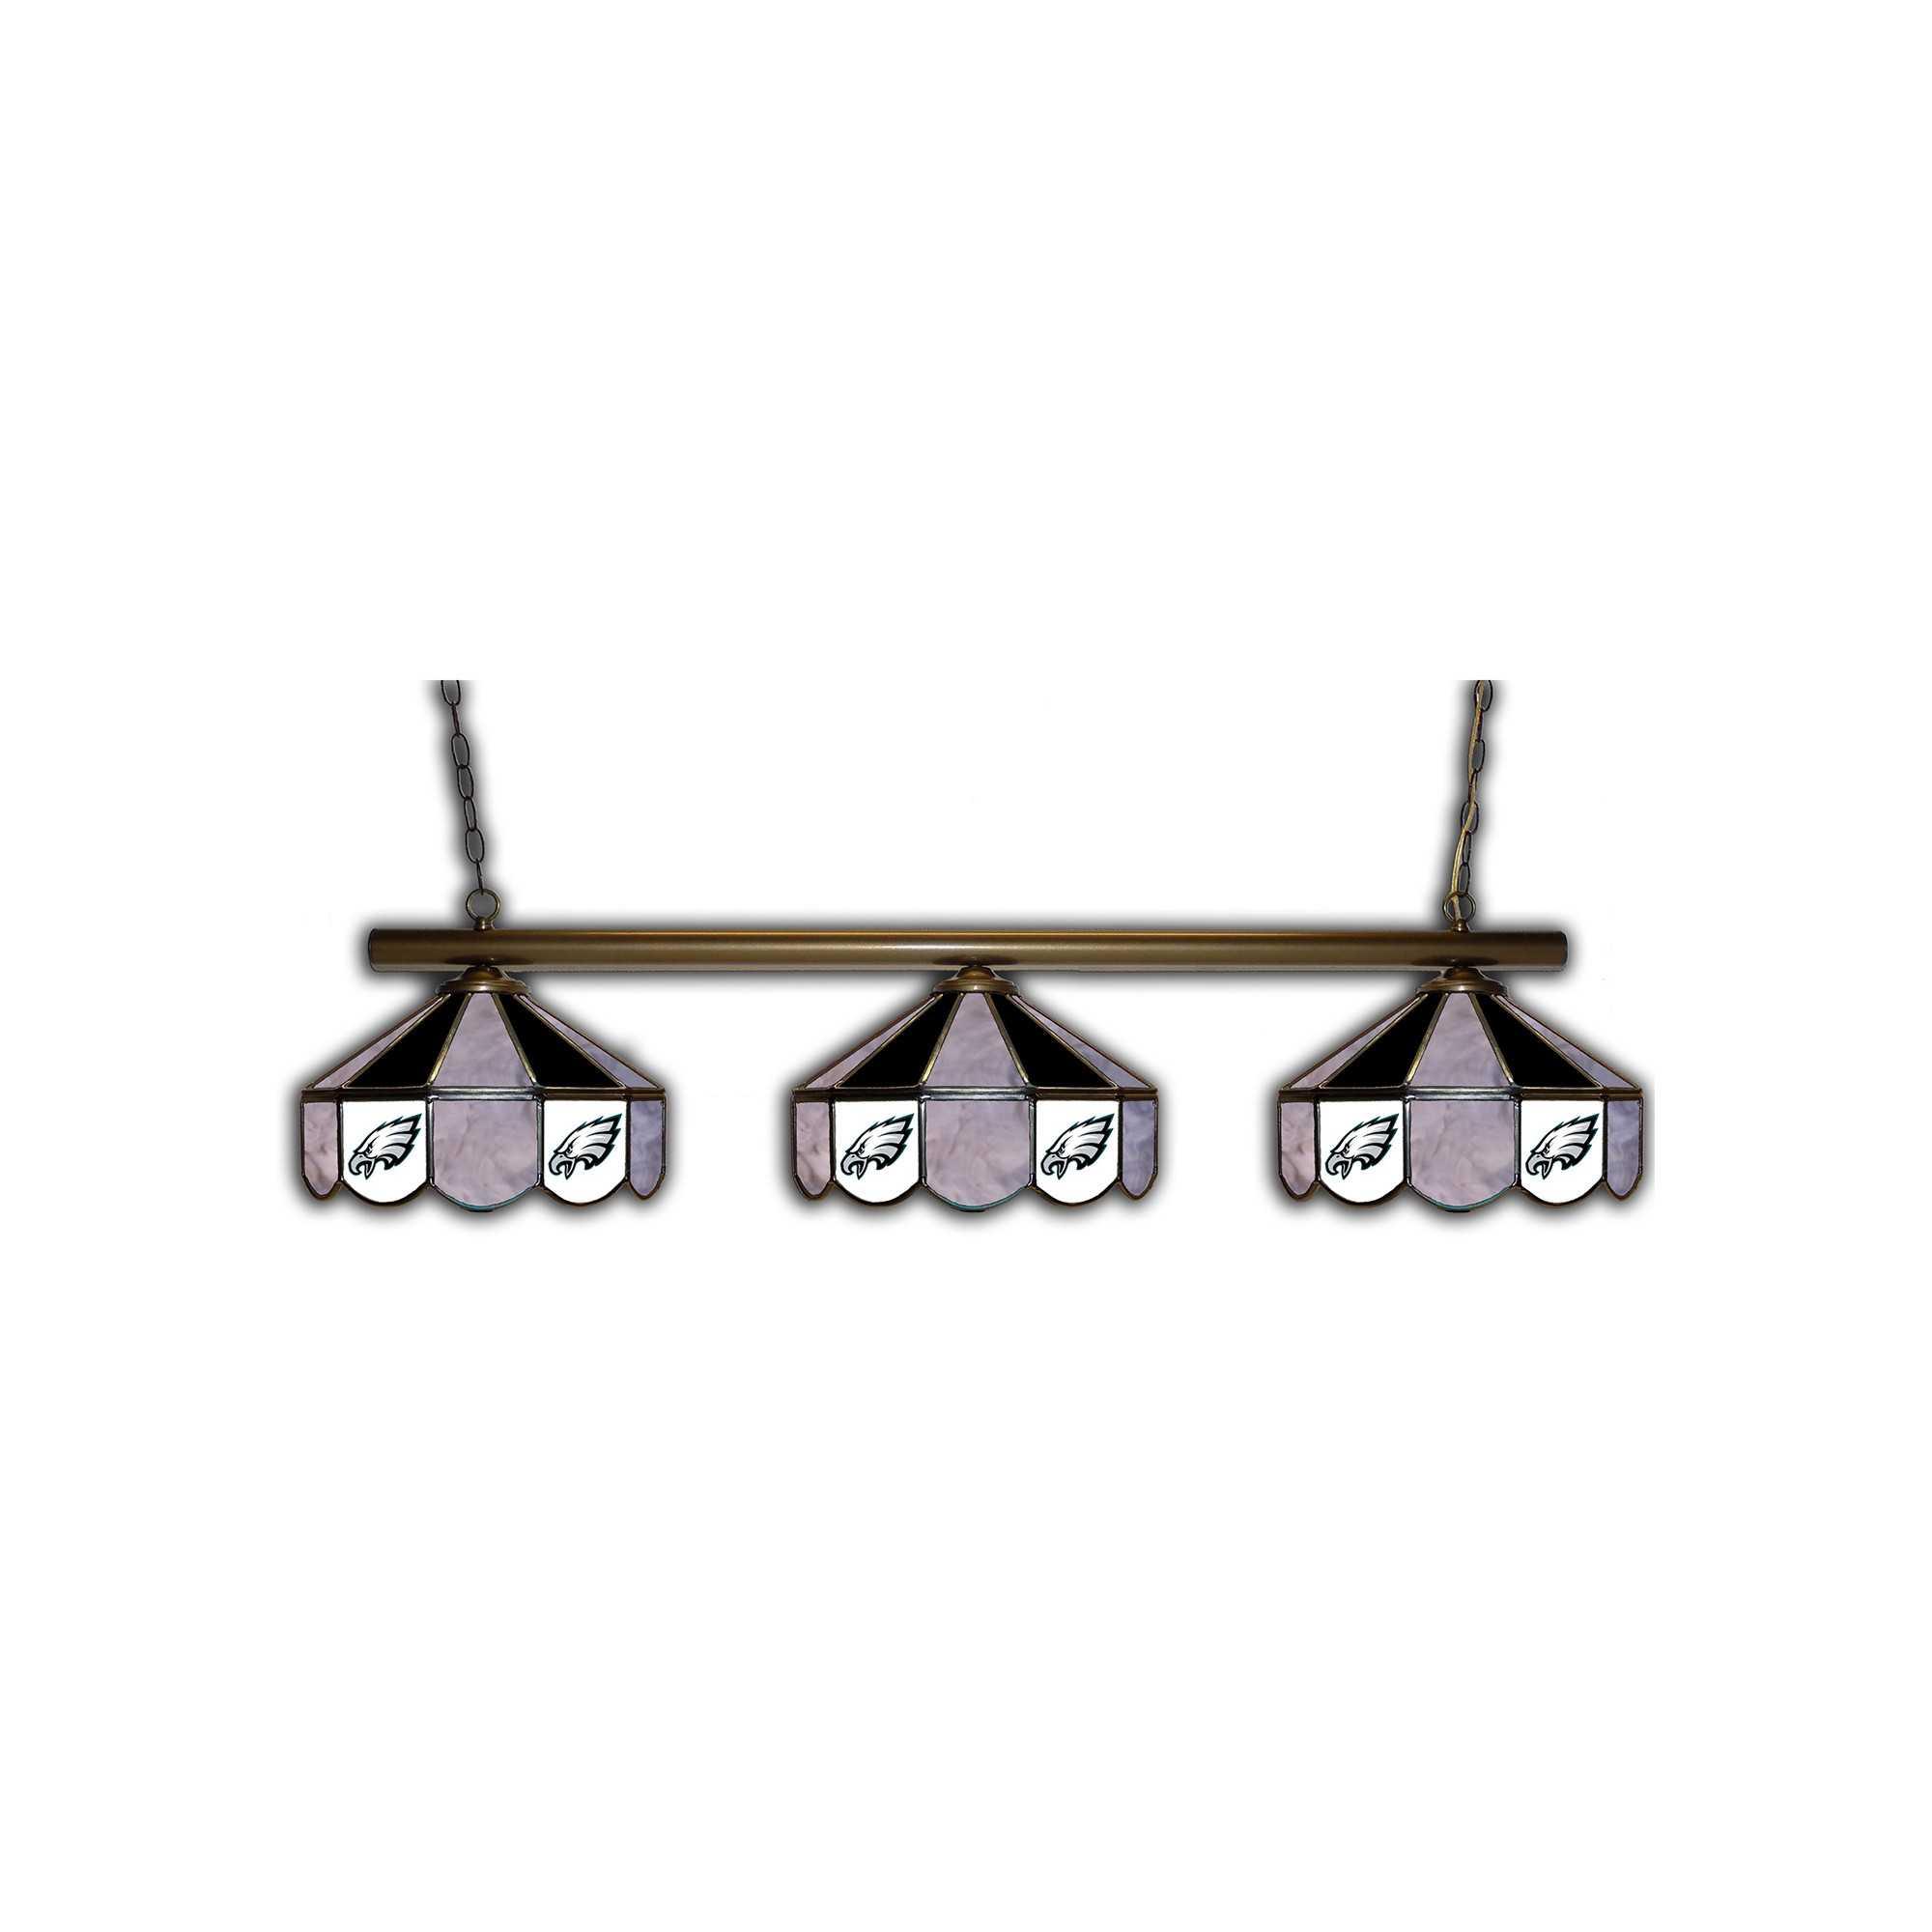 PHILADELPHIA EAGLES GLASS 3 SHADE LAMP (BAR)